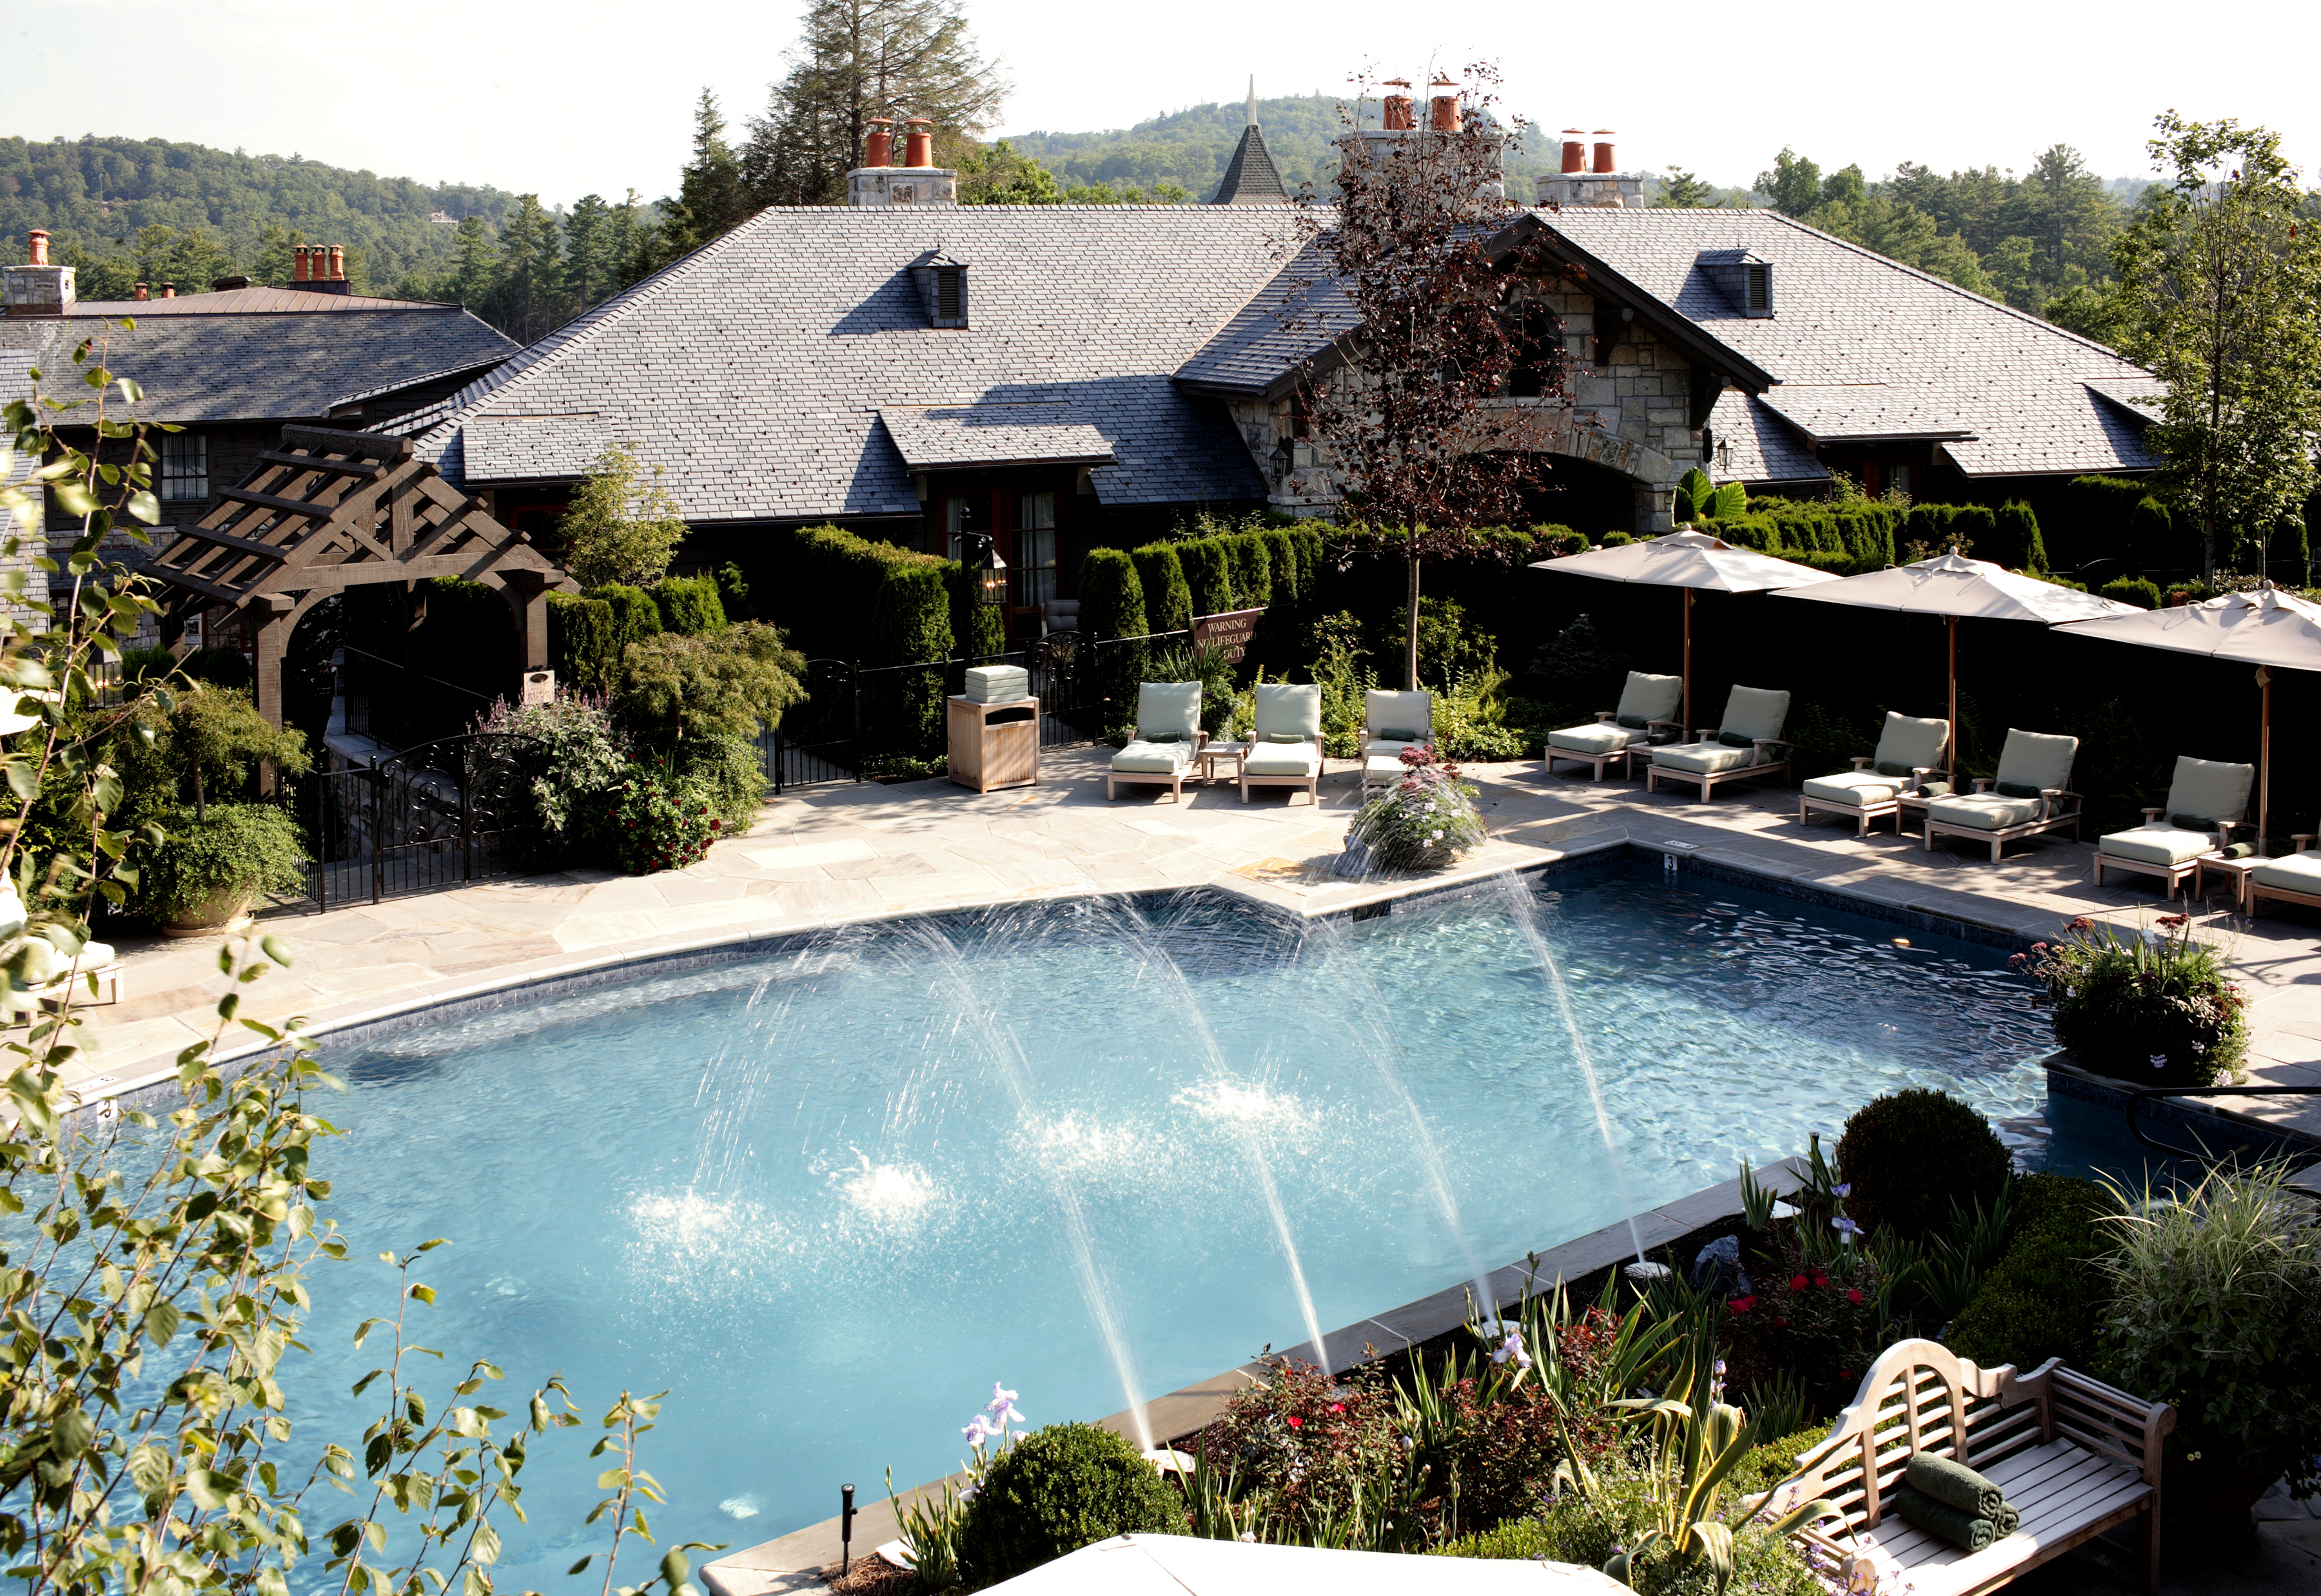 Lesbian resort in asheville nc